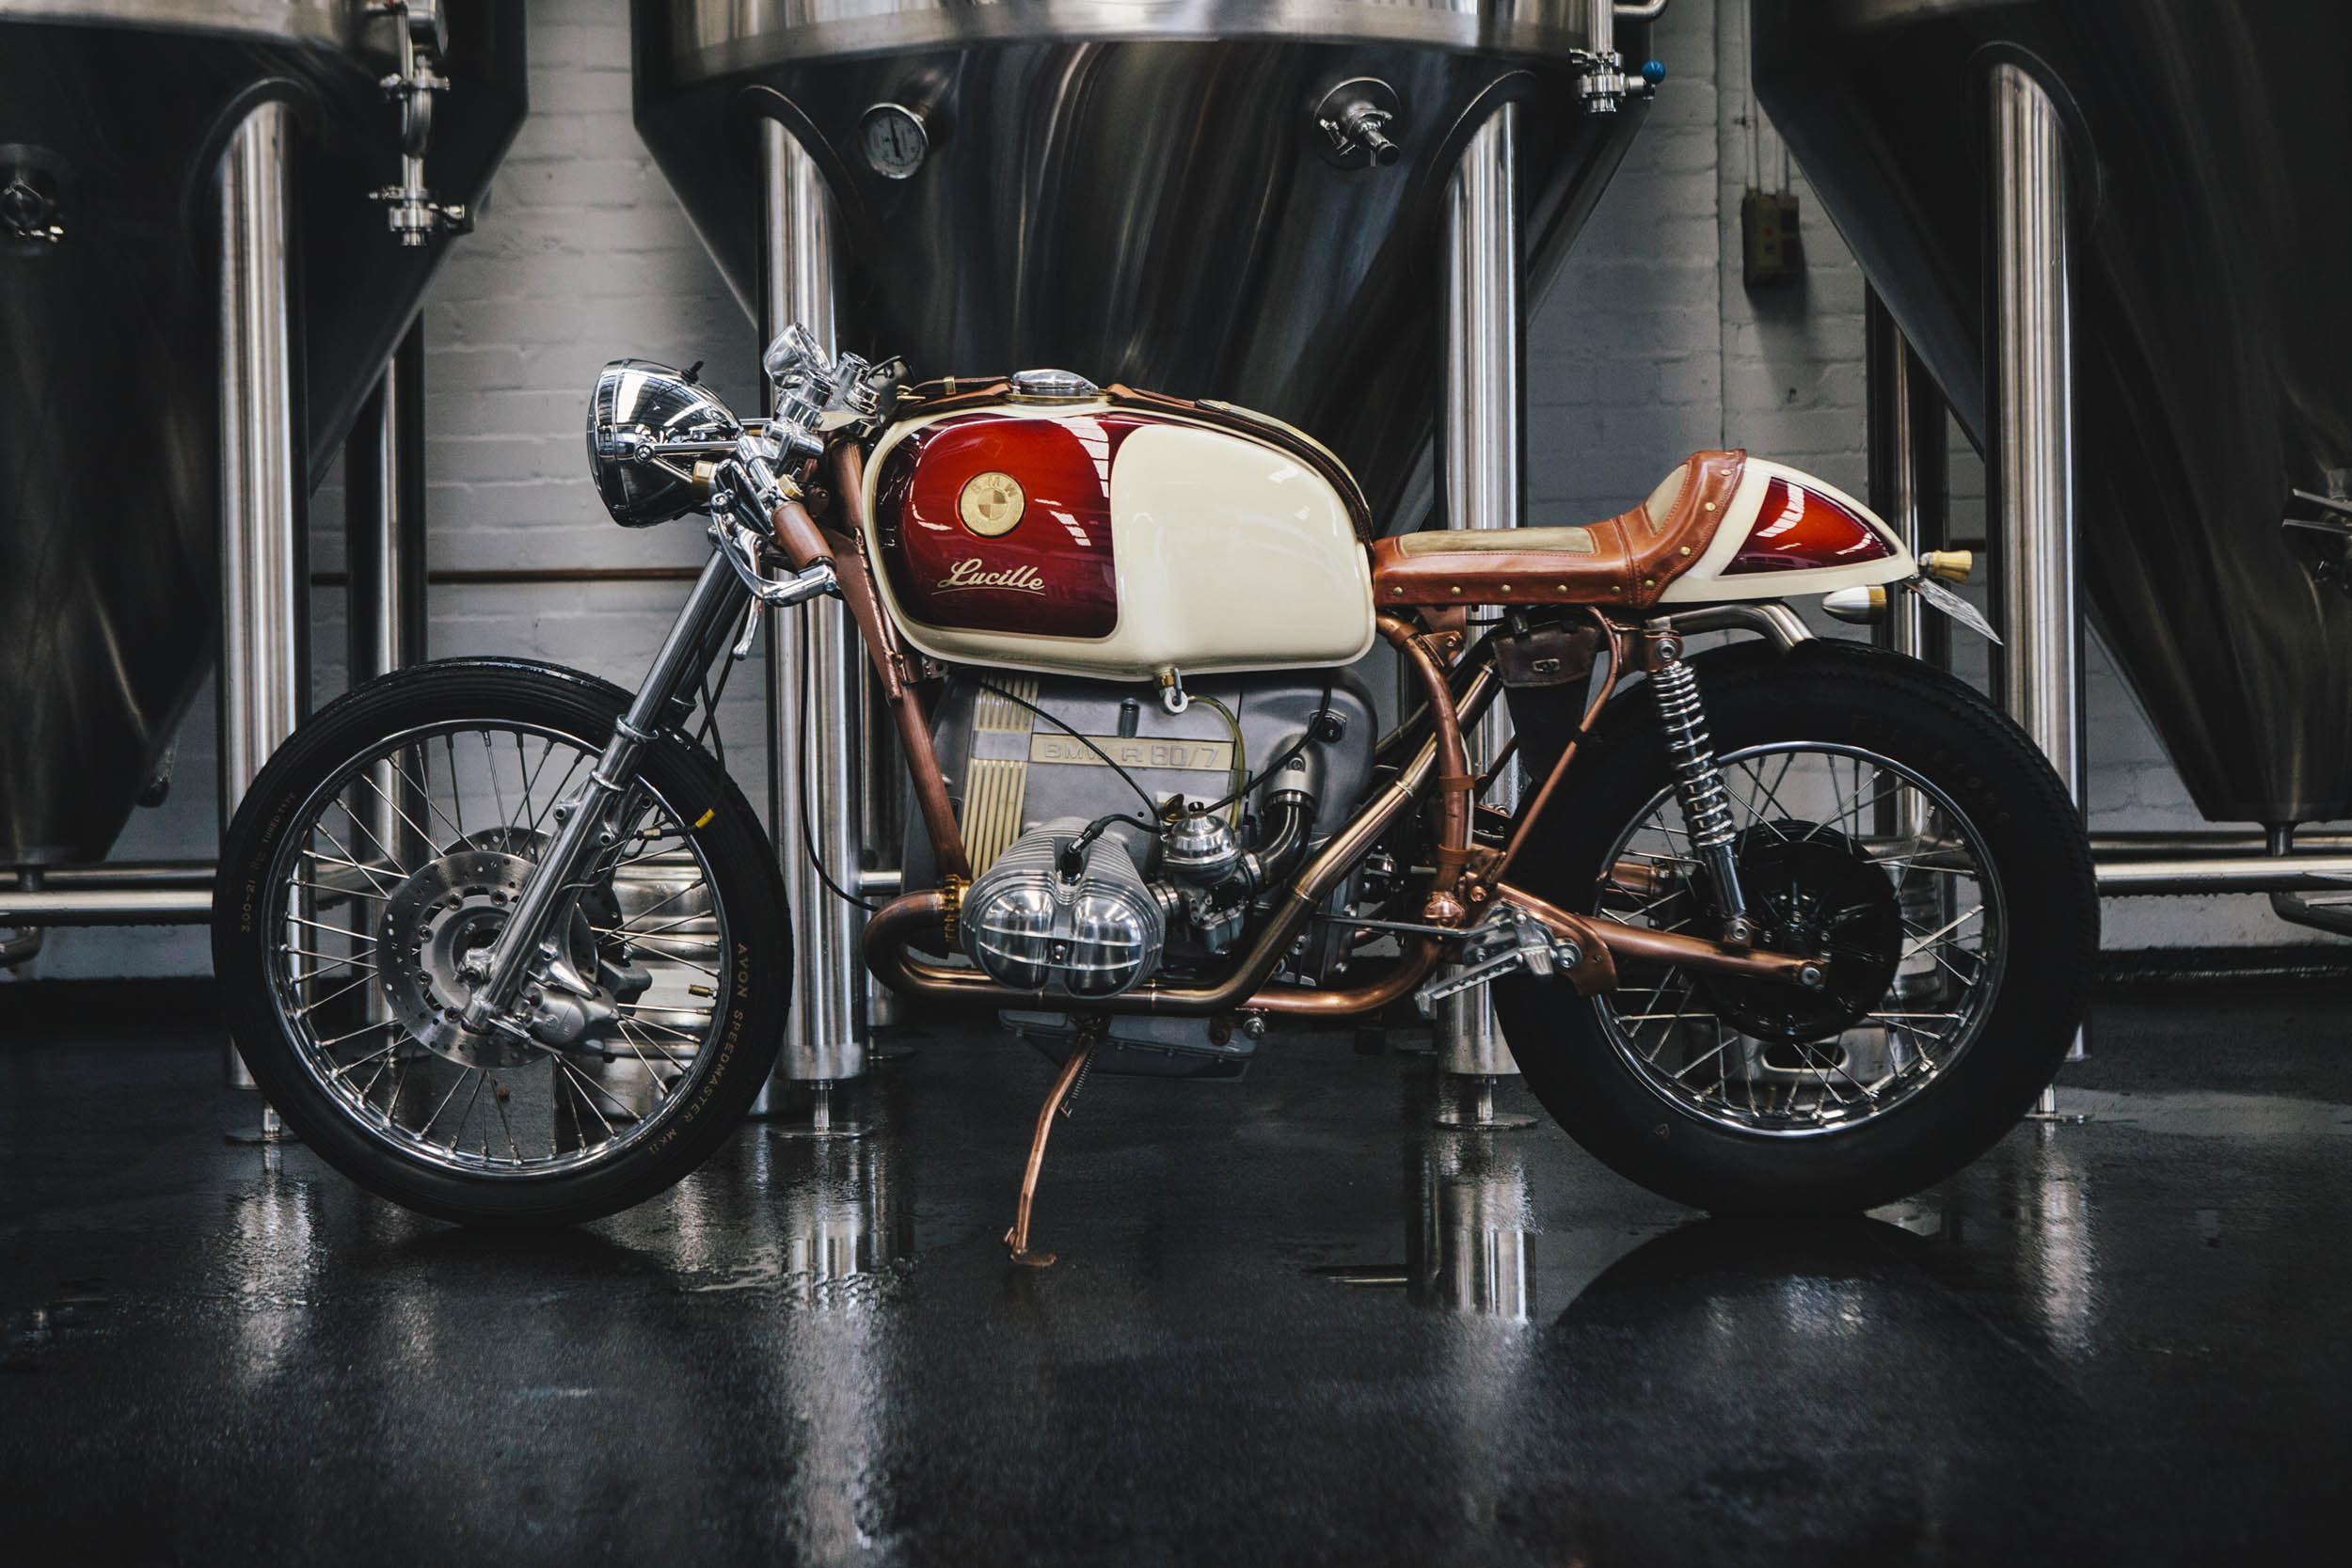 BMW_CAFE_RACER_R80_1840_Cover.jpg